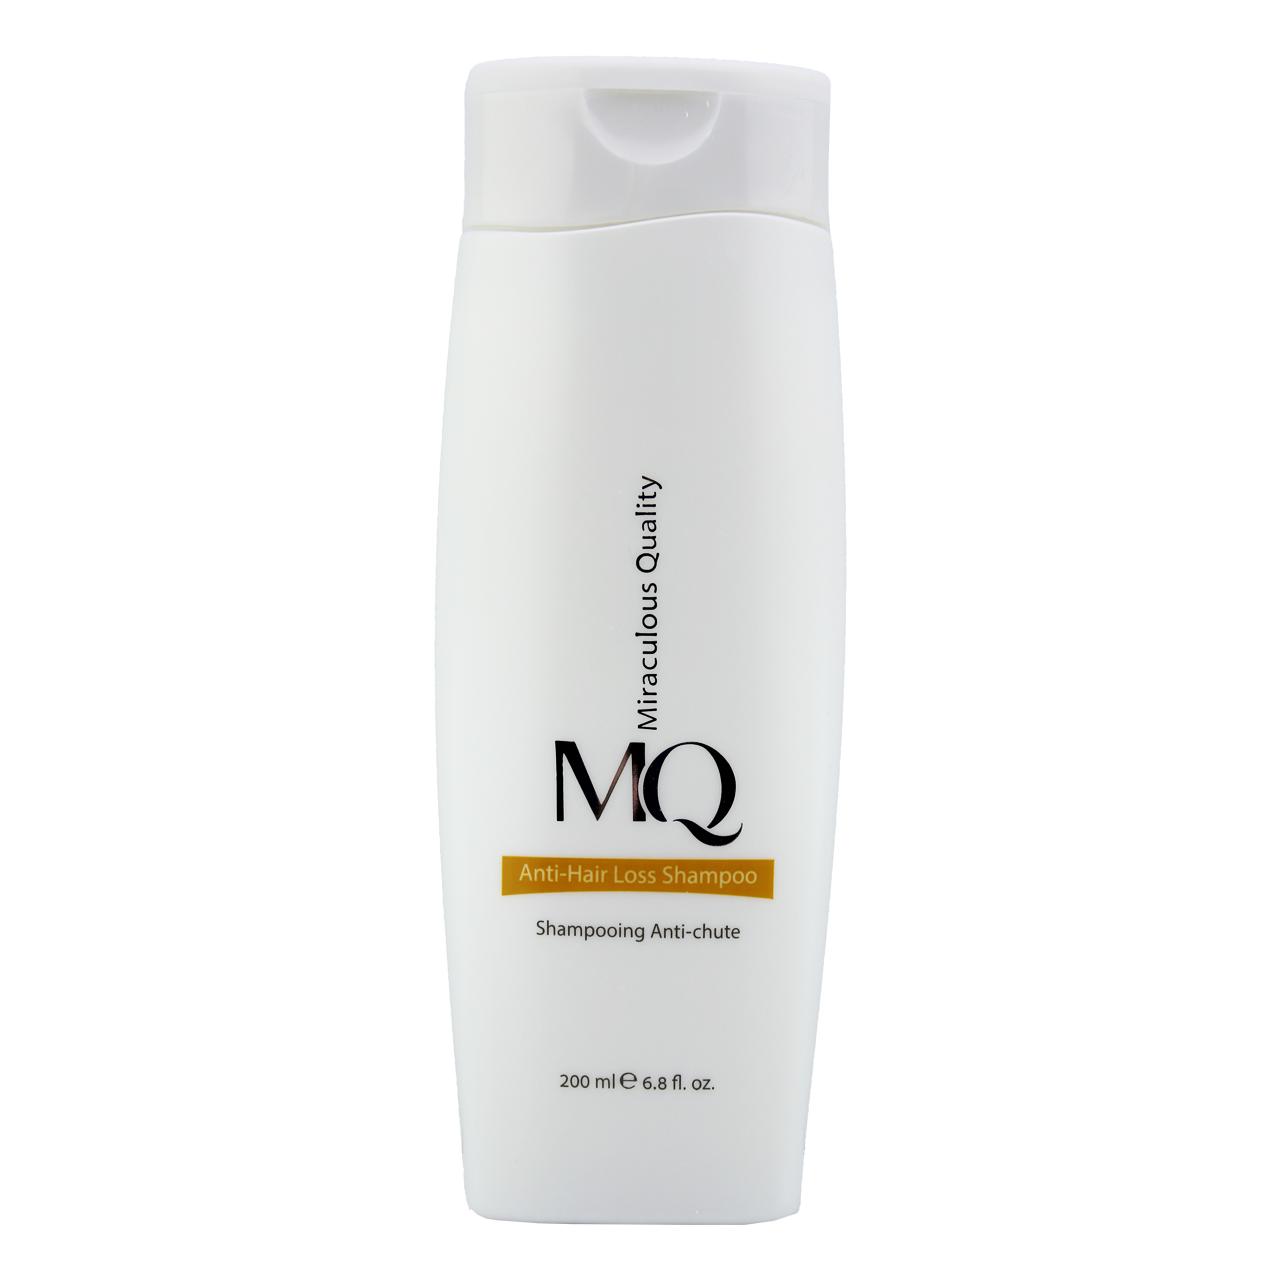 خرید                      شامپو ضد ریزش و تقویت کننده مو ام کیو مدل Anti-Hair Loss حجم 200 میلی لیتر